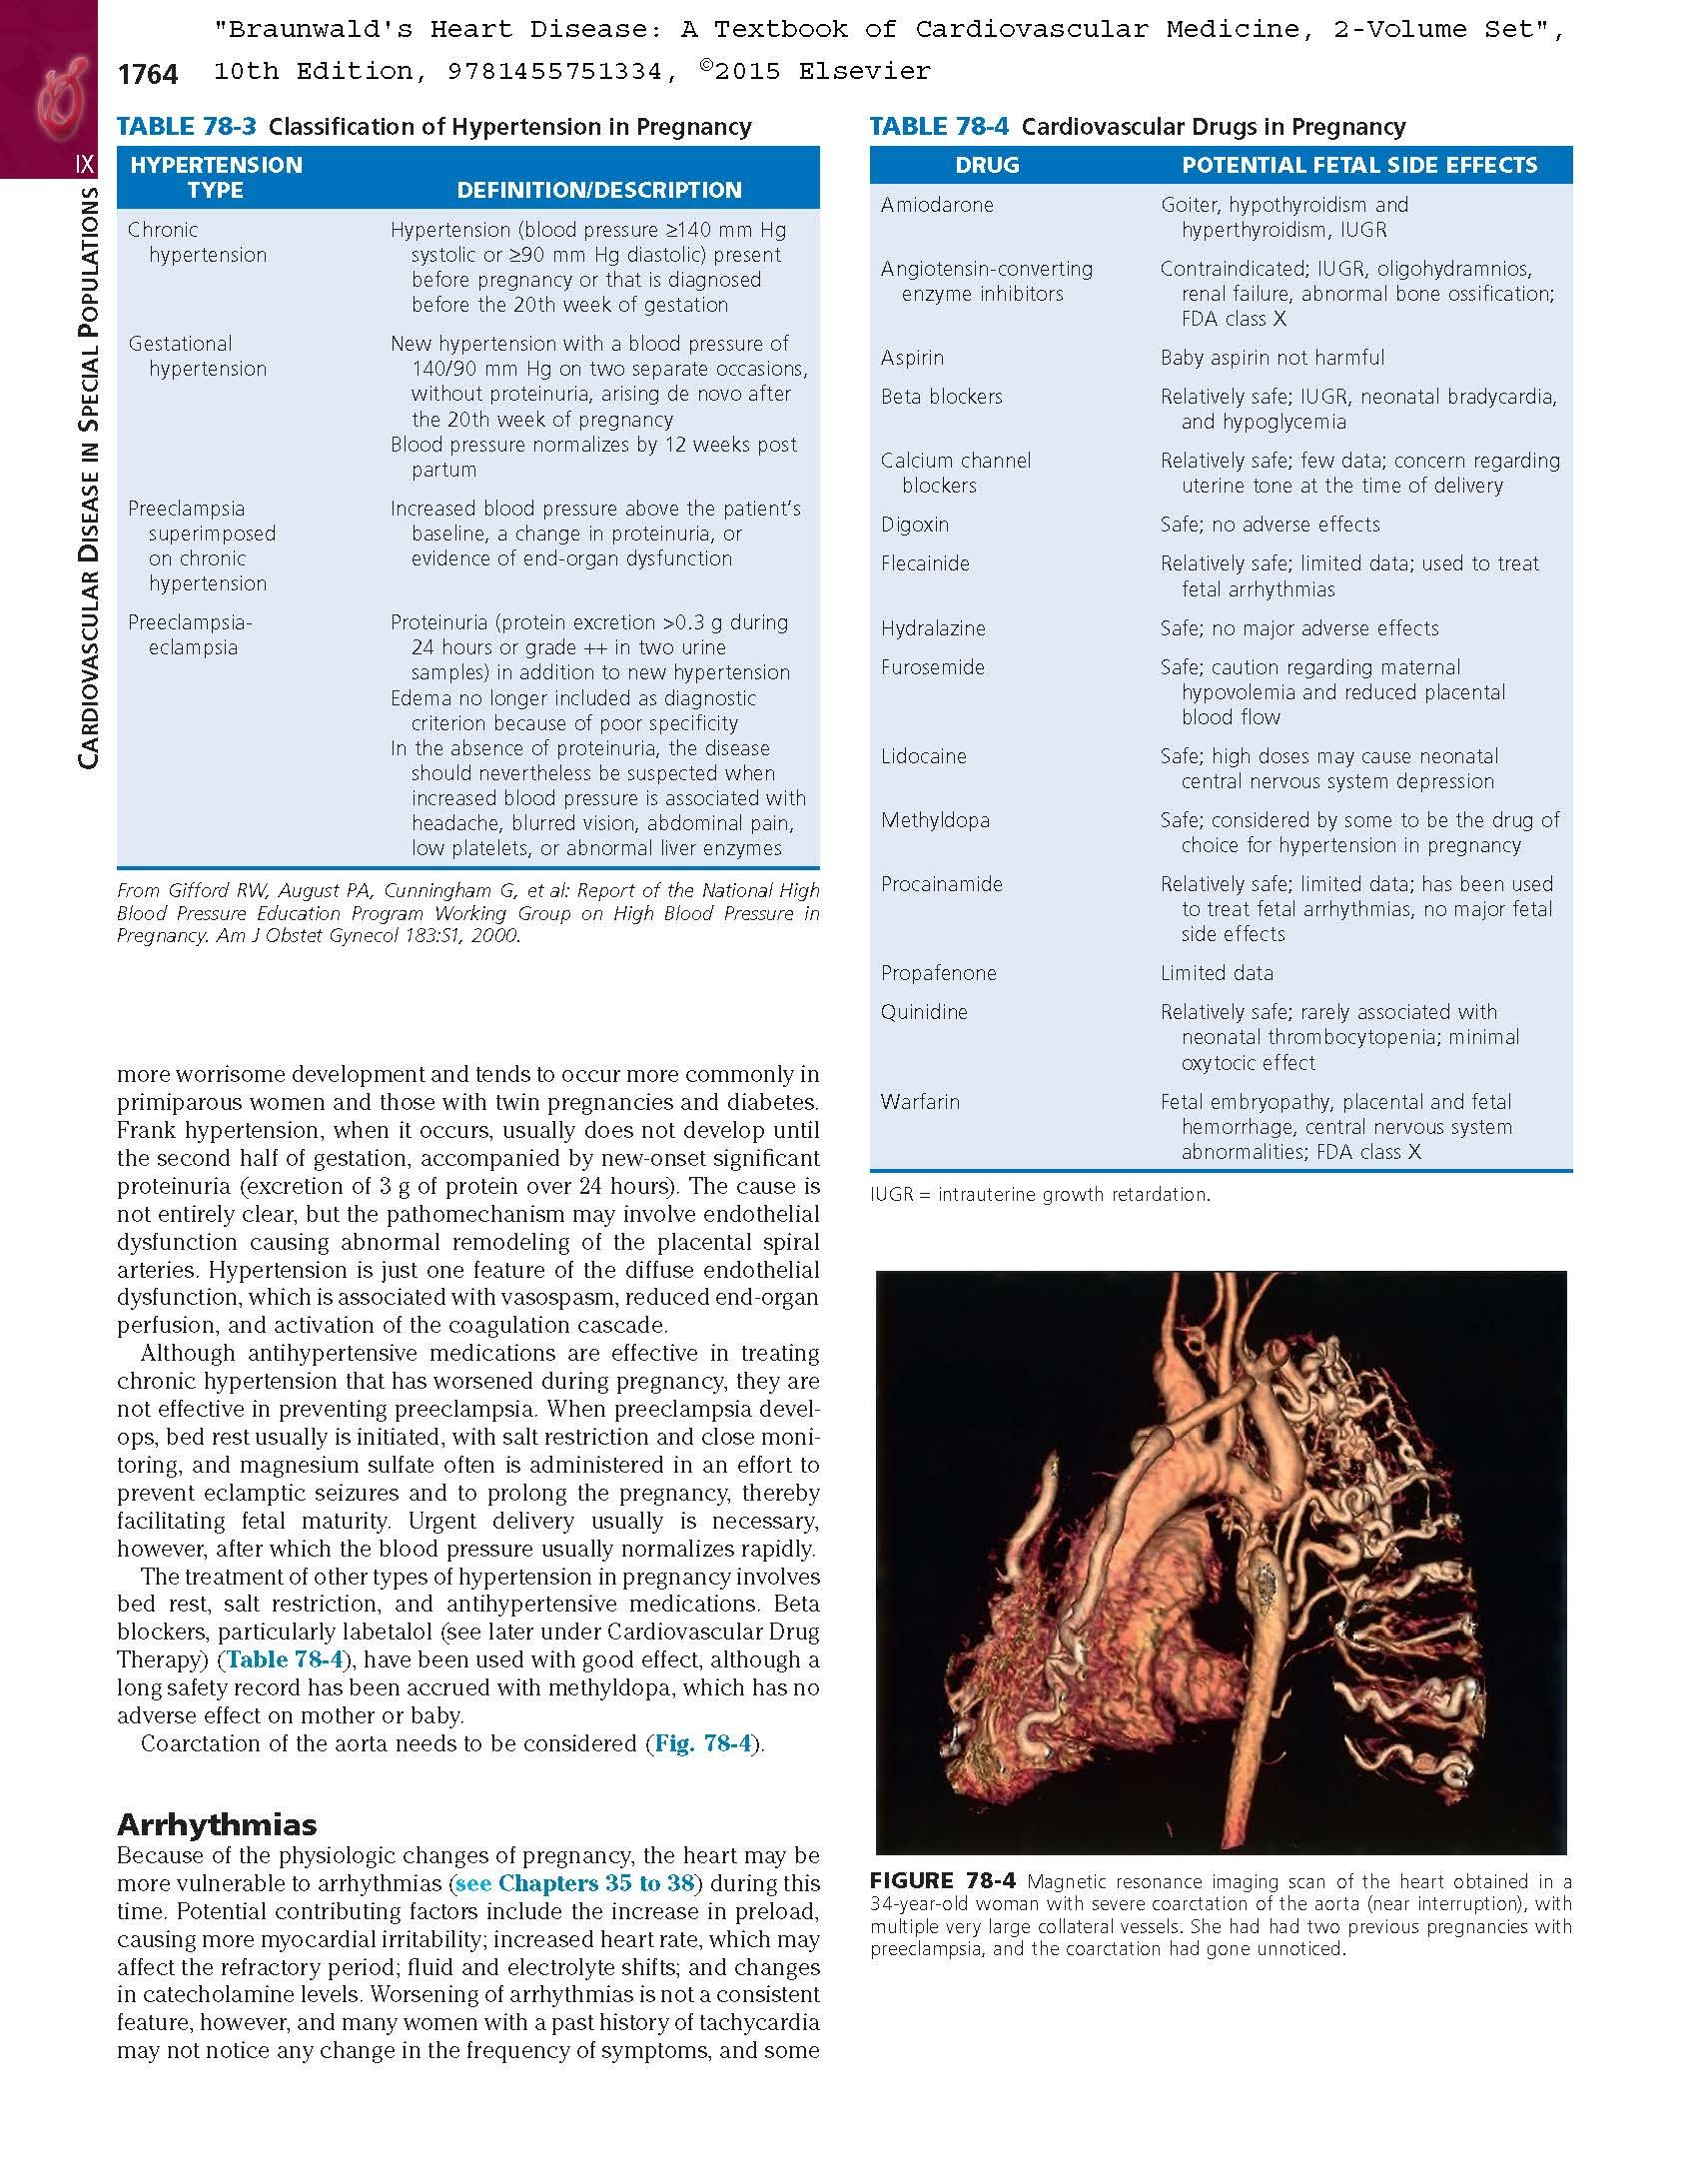 Braunwalds Heart Disease: A Textbook of Cardiovascular Medicine, 2-Volume Set, 10e: Amazon.es: Douglas L. Mann MD, Douglas P. Zipes MD, Peter Libby MD PhD, ...